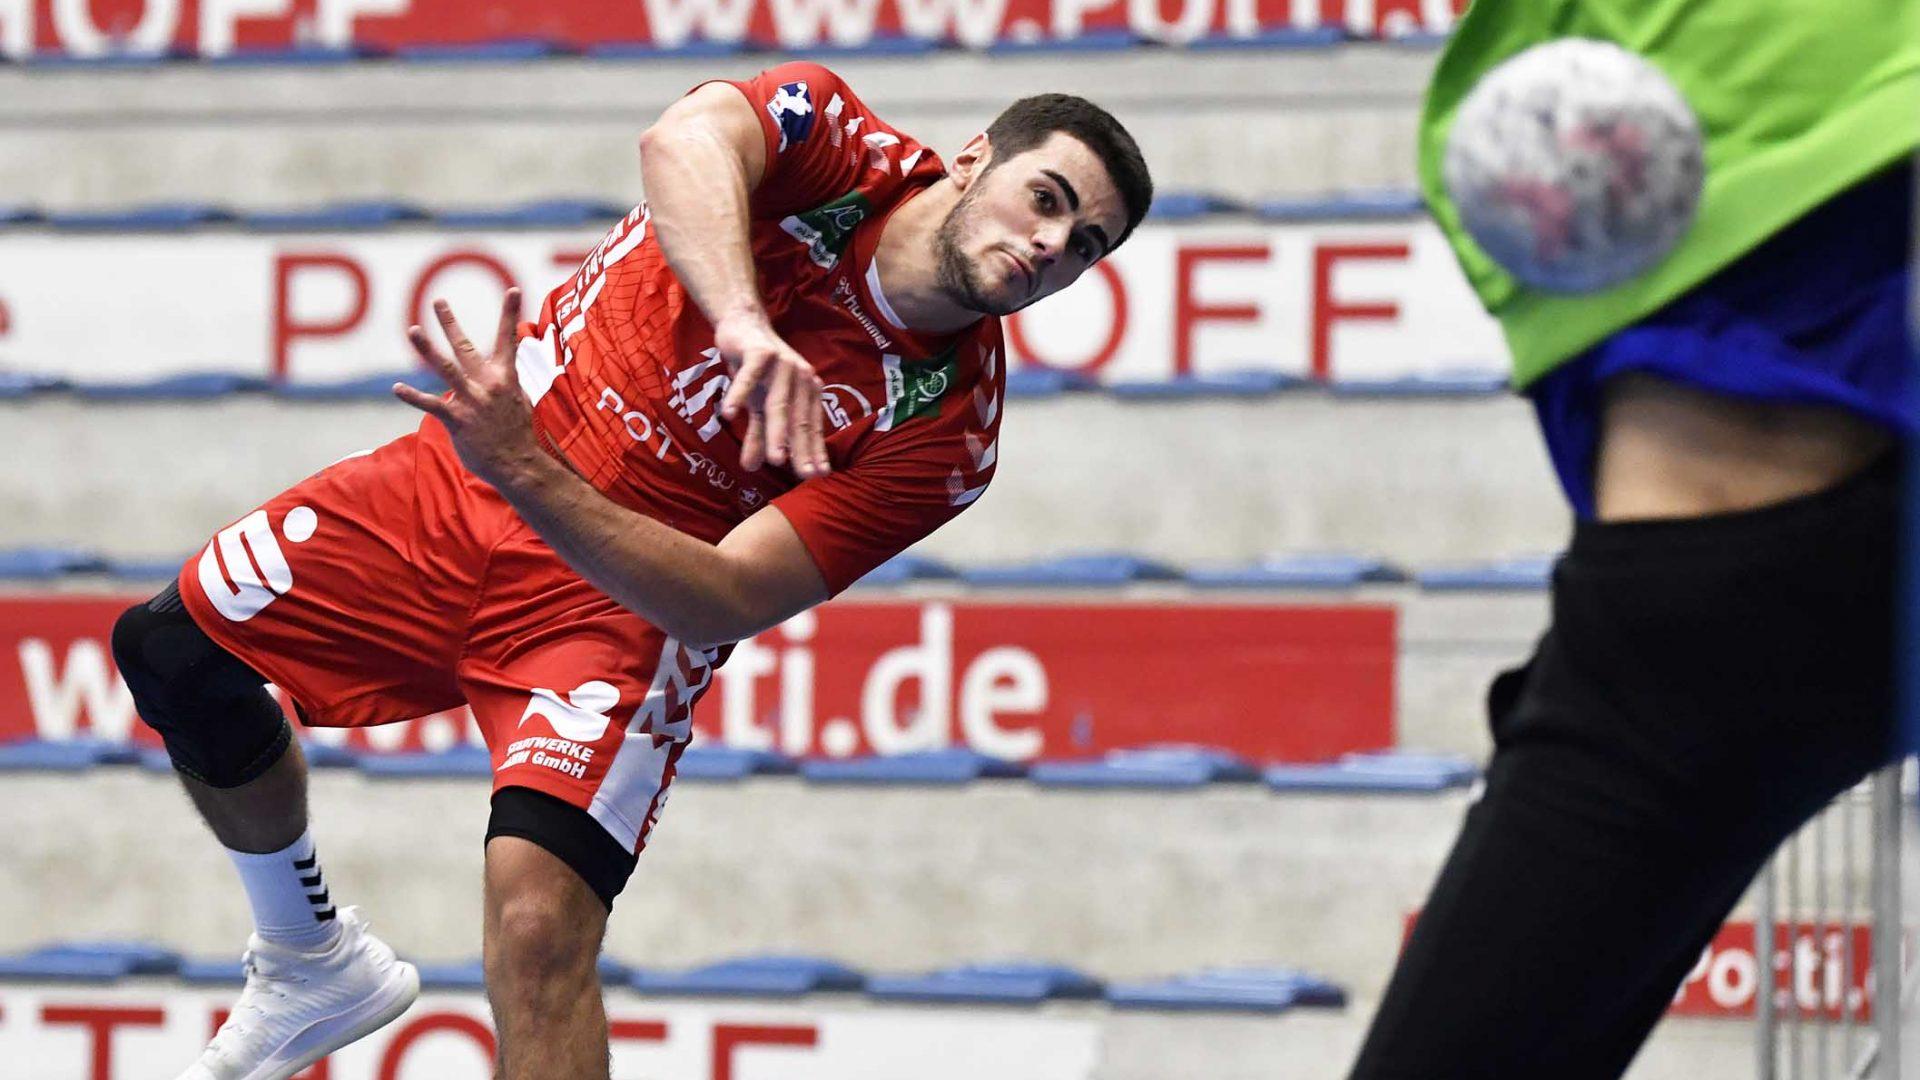 Handball ASV Hamm-Hildesheim Alex Rubino